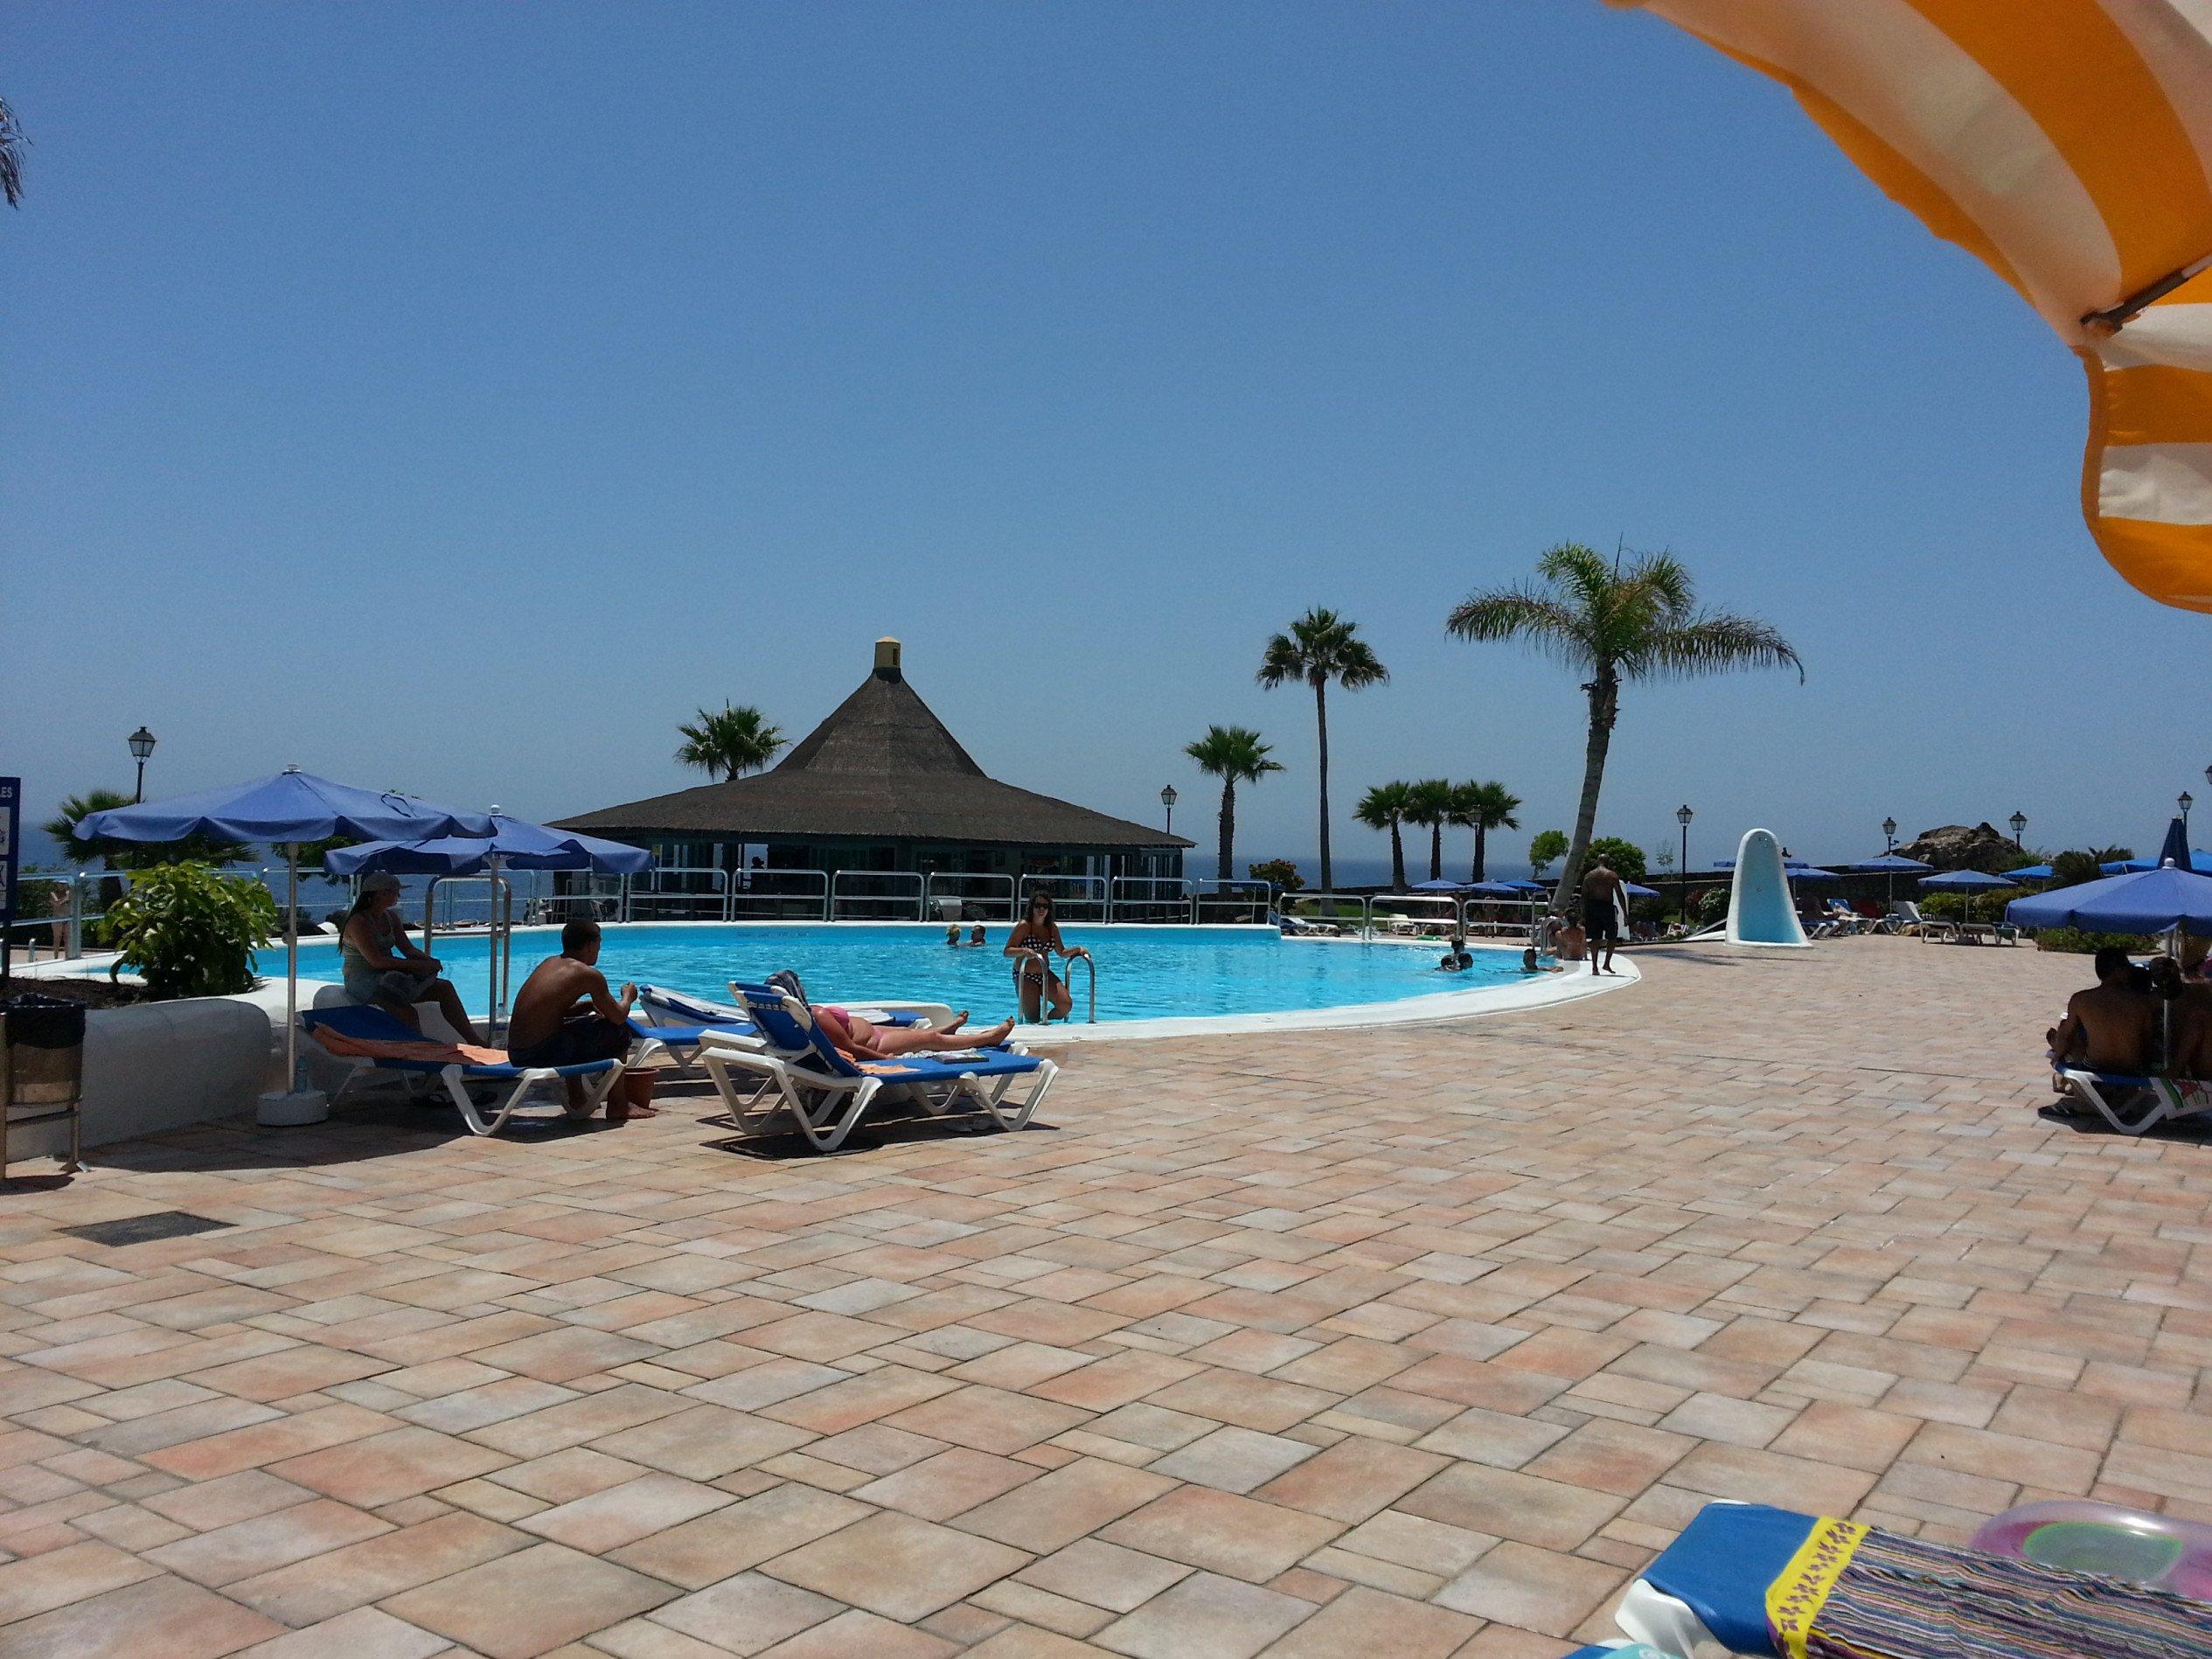 rdmzwembad2.jpg